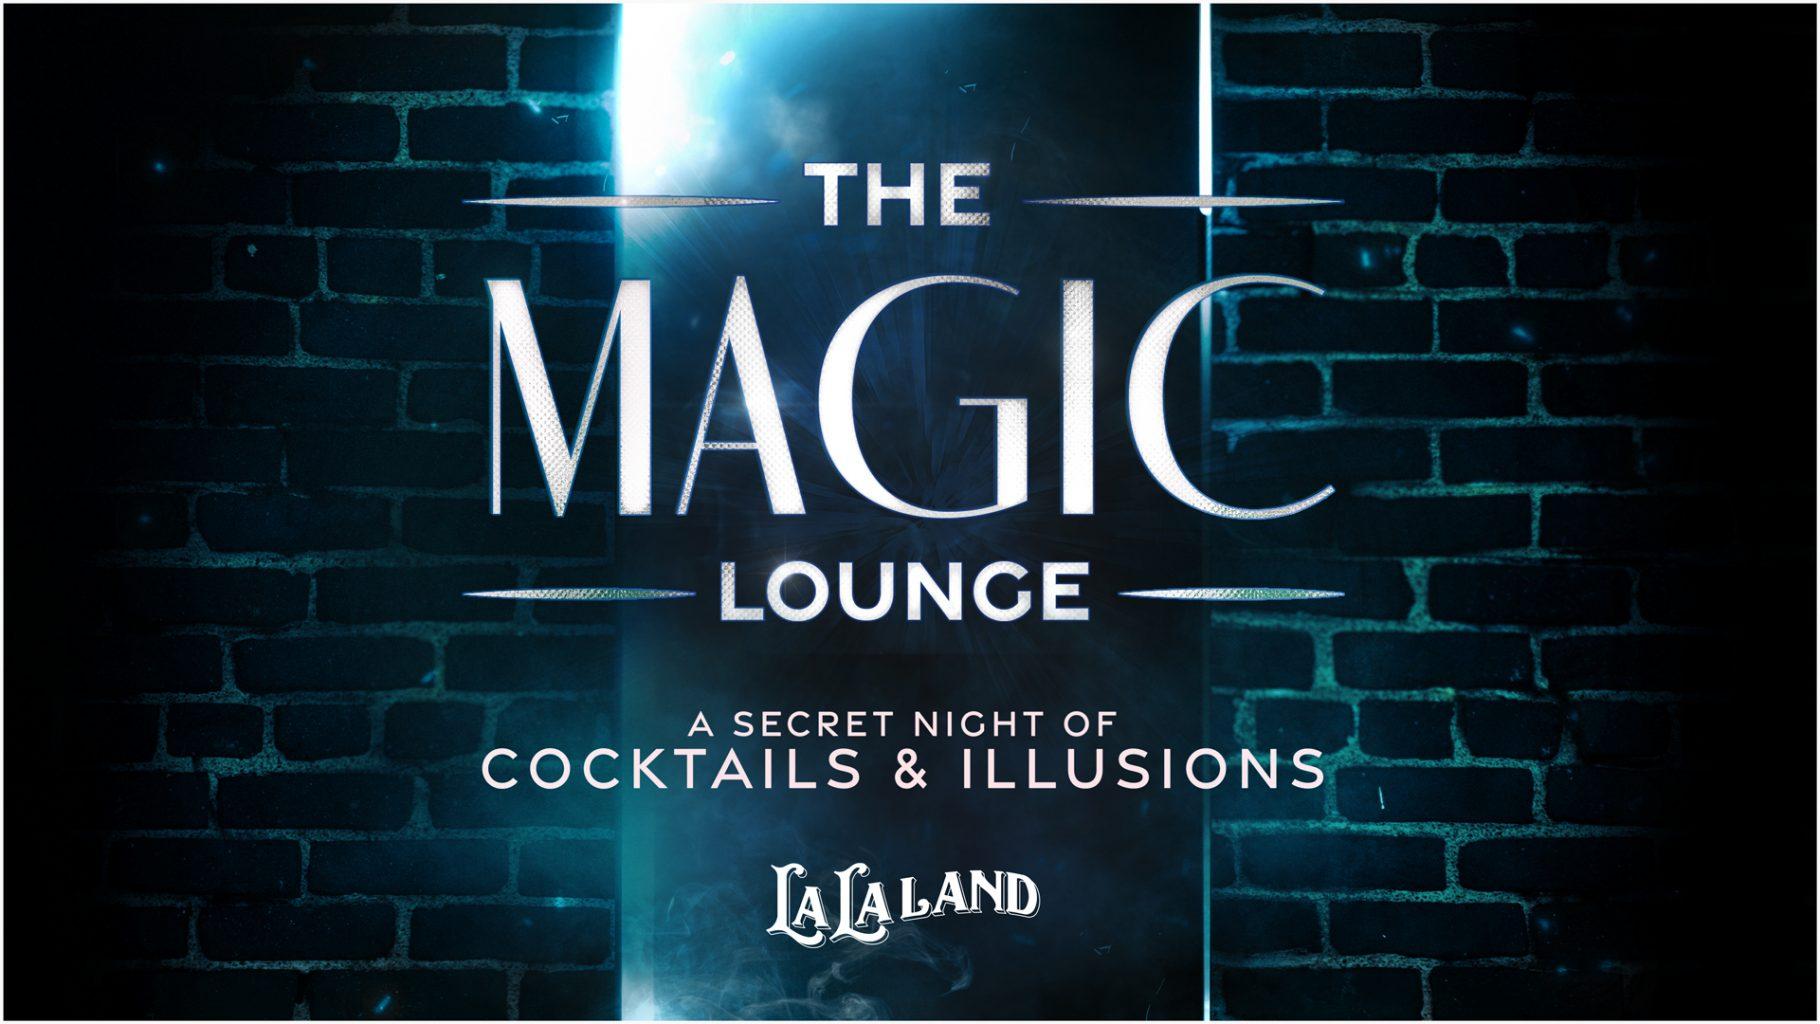 The Magic Lounge